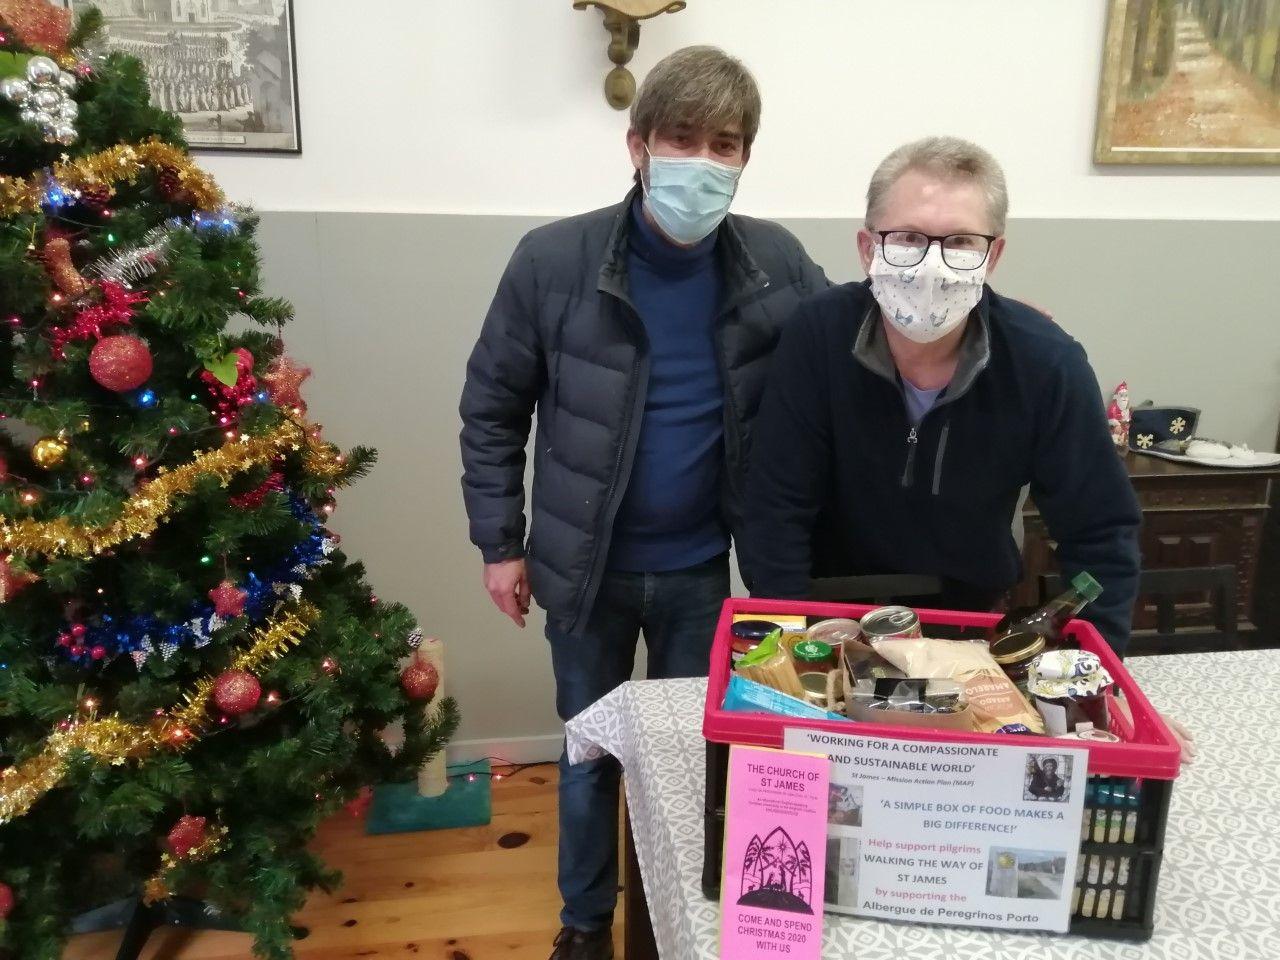 St James' continued support of the Albergue de Peregrinos do Porto with Christmas goods.